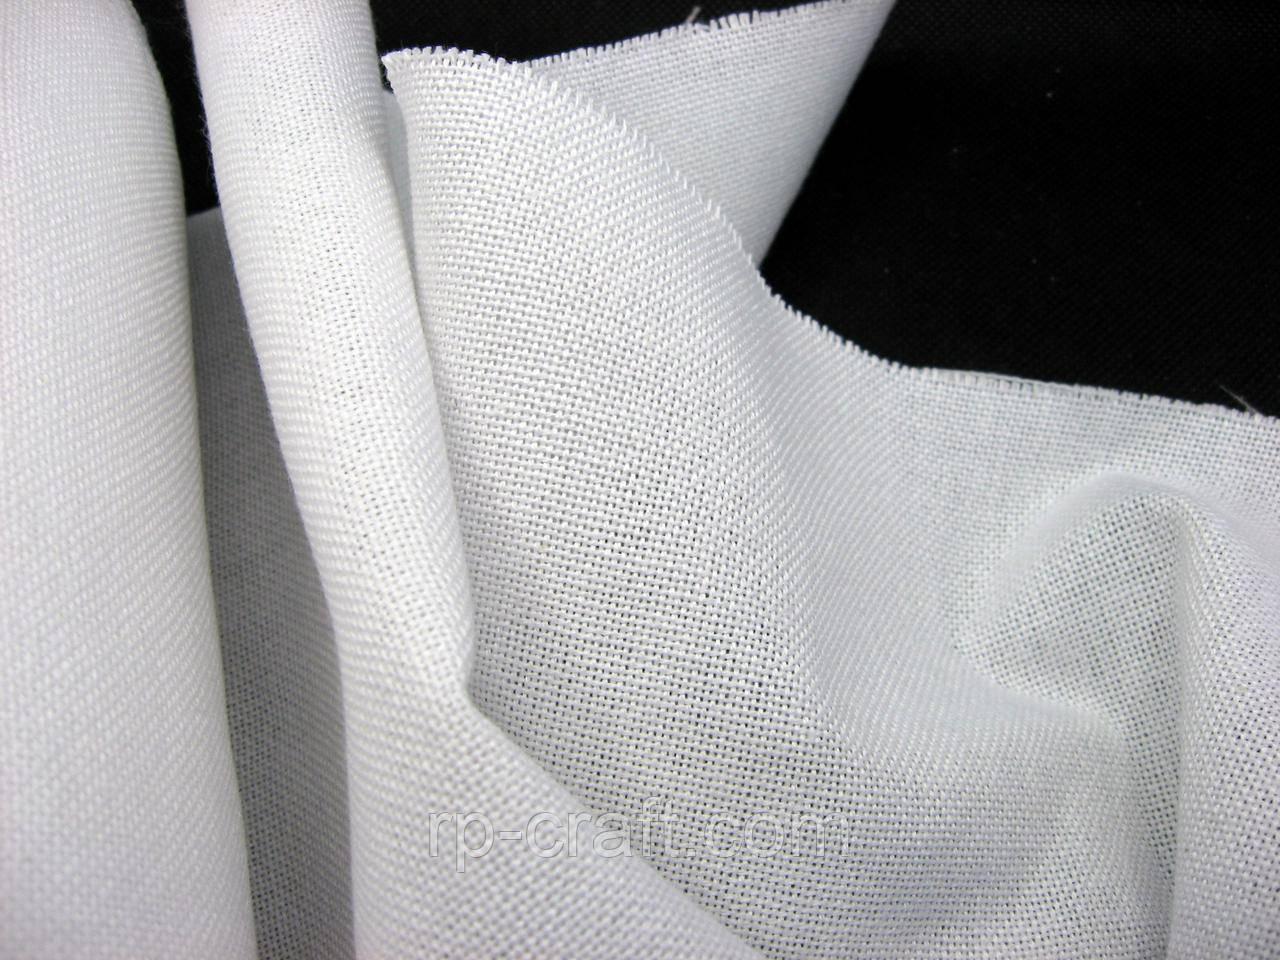 Рушникове полотно. Біле. Ширина 37 см